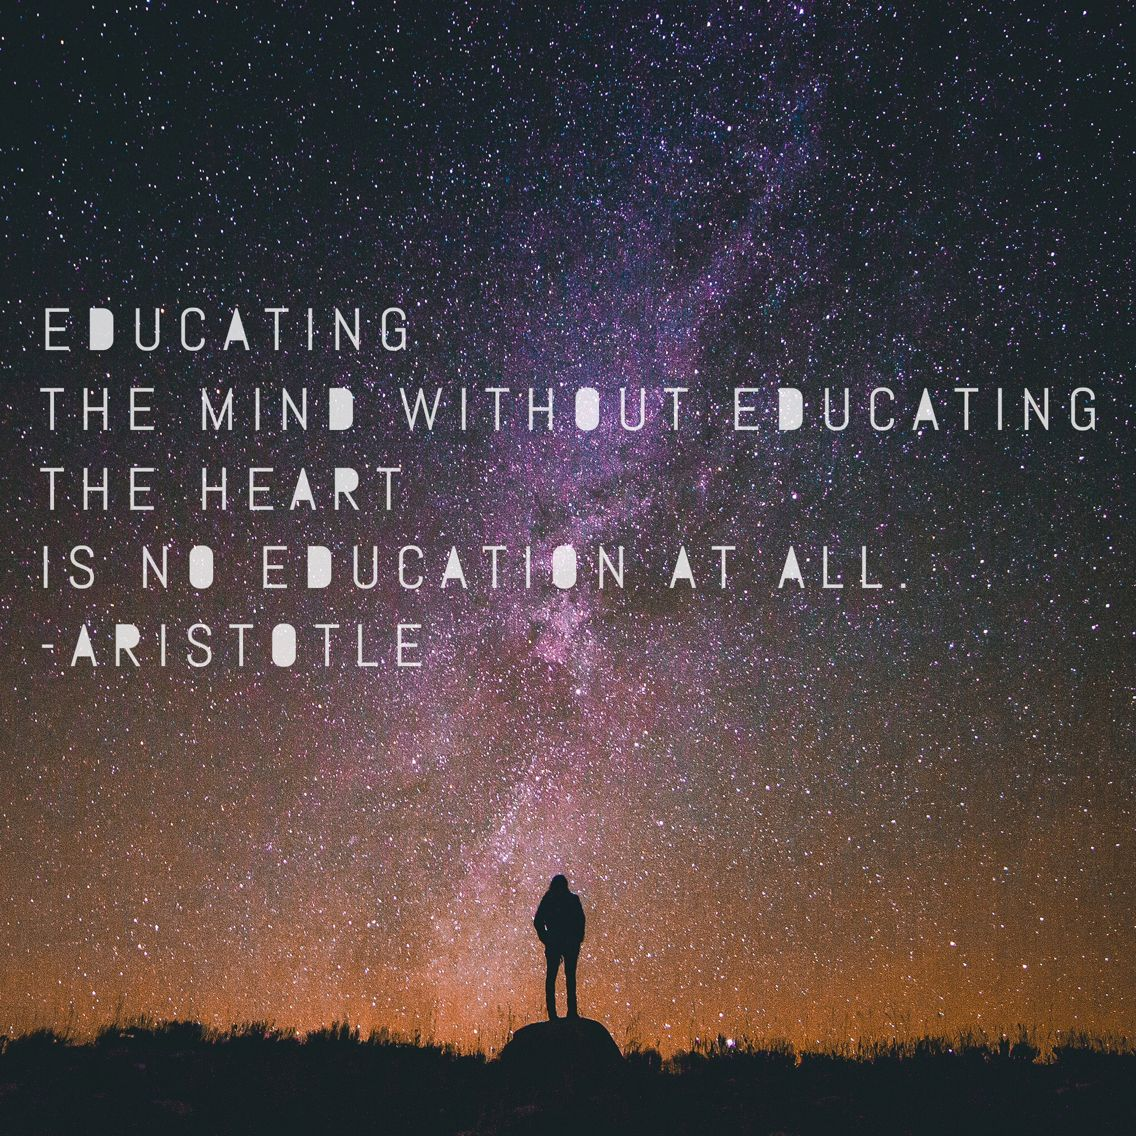 Aristotle | Spirituality, Words, Aristotle